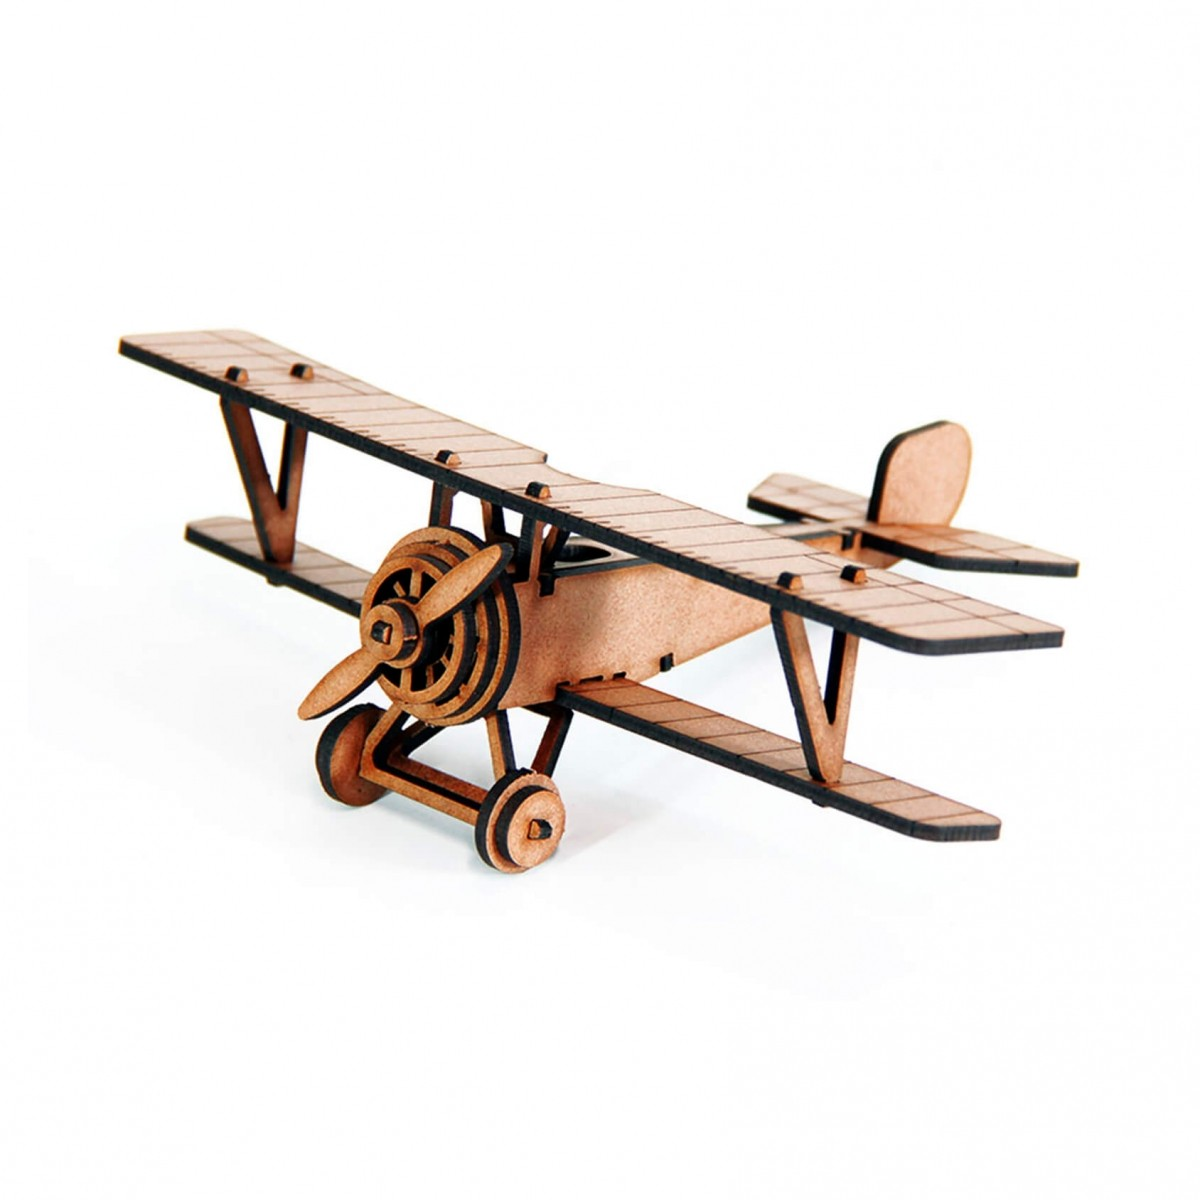 Miniatura para montar Nieuport 17 (Cutz)